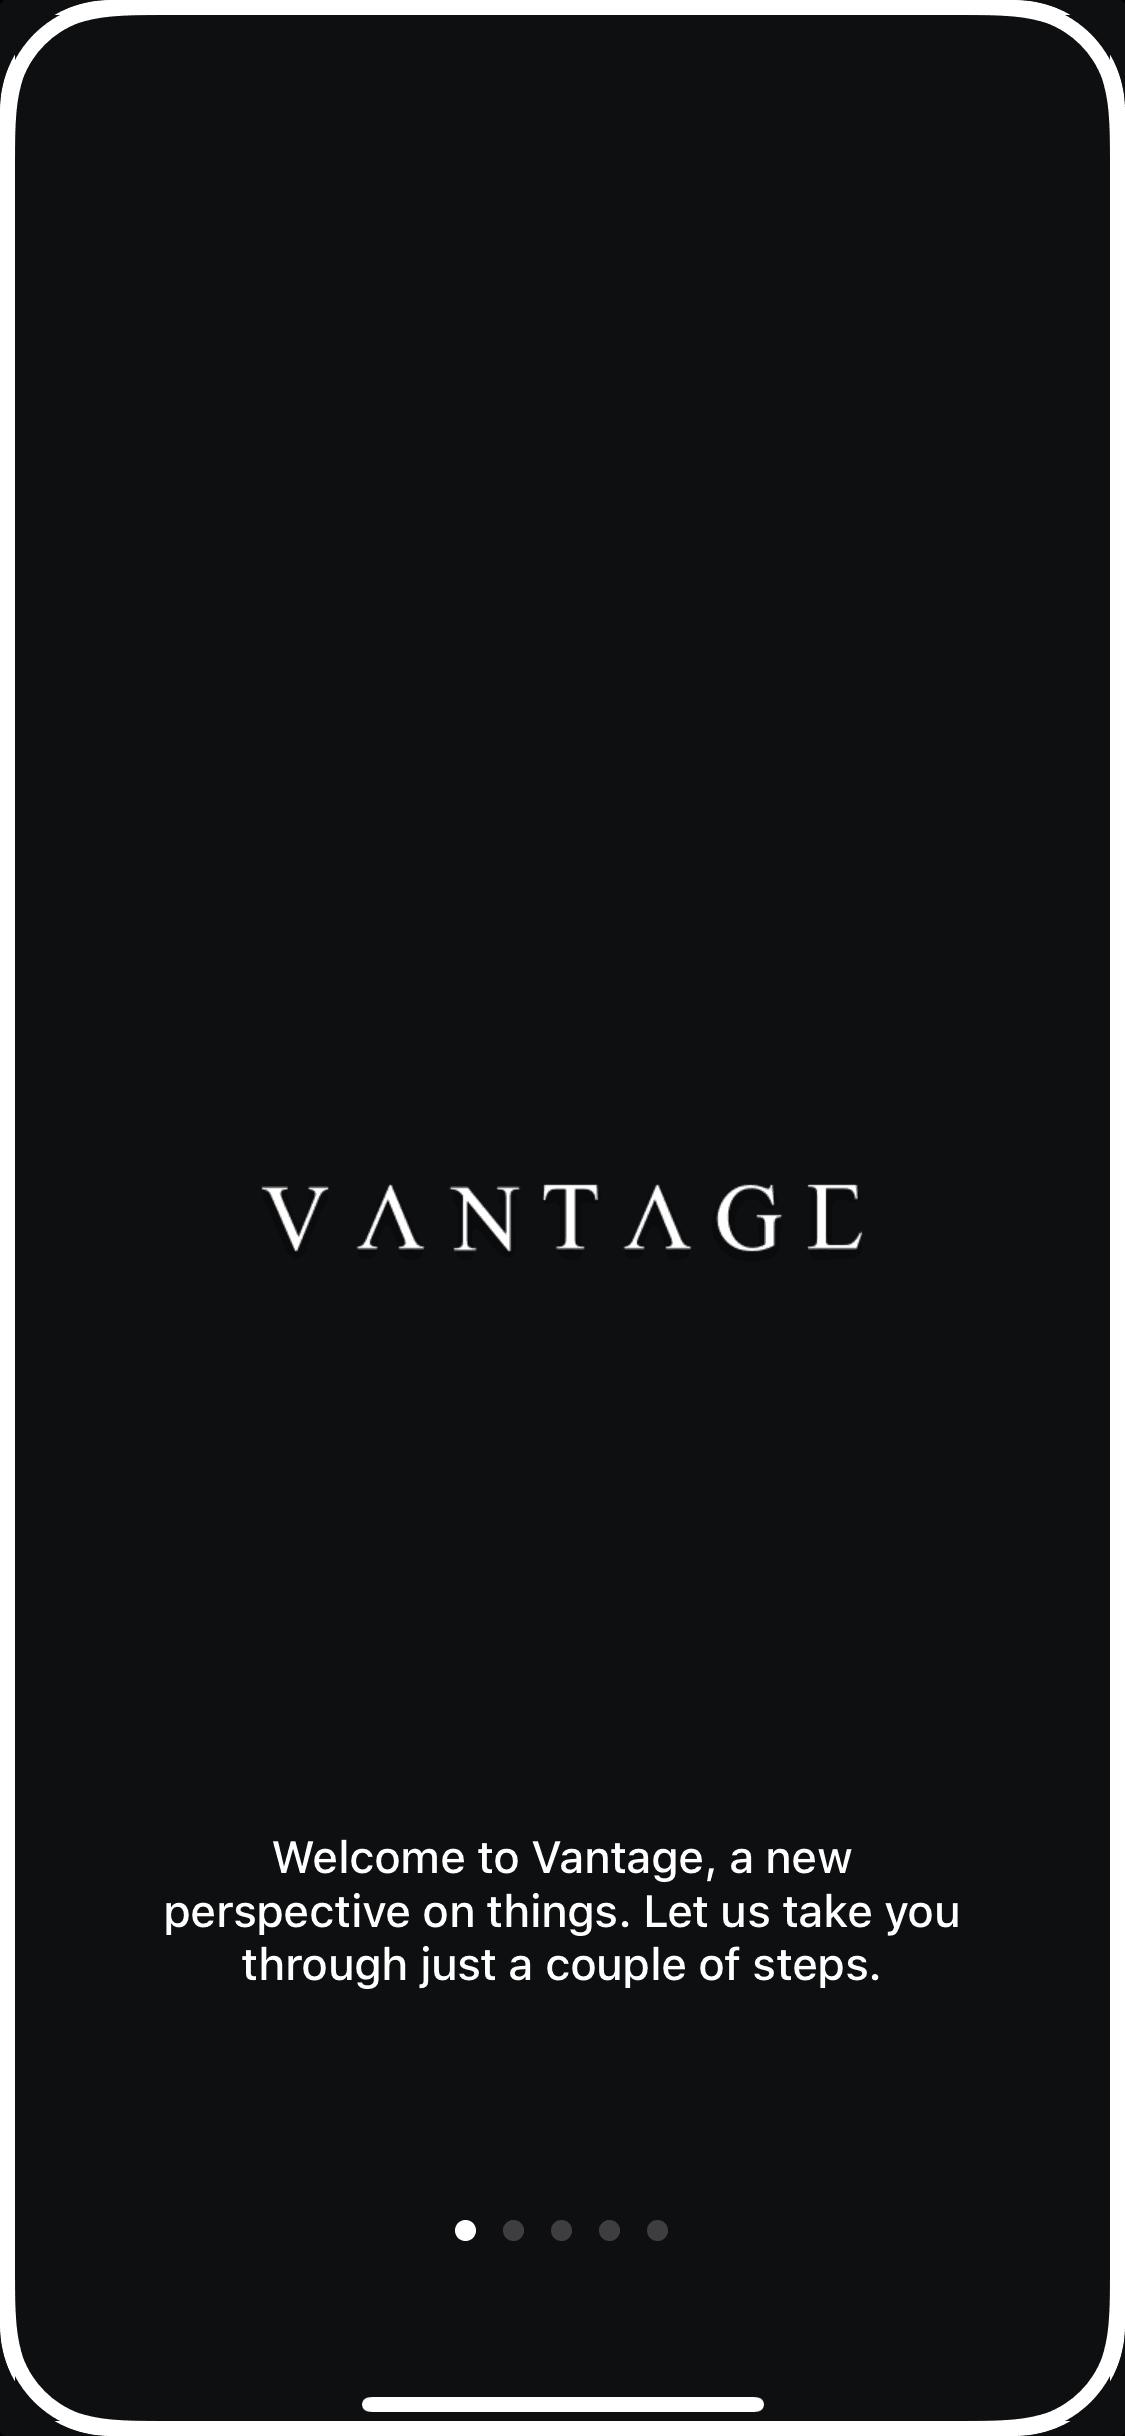 Walkthrough on iOS by Vantage